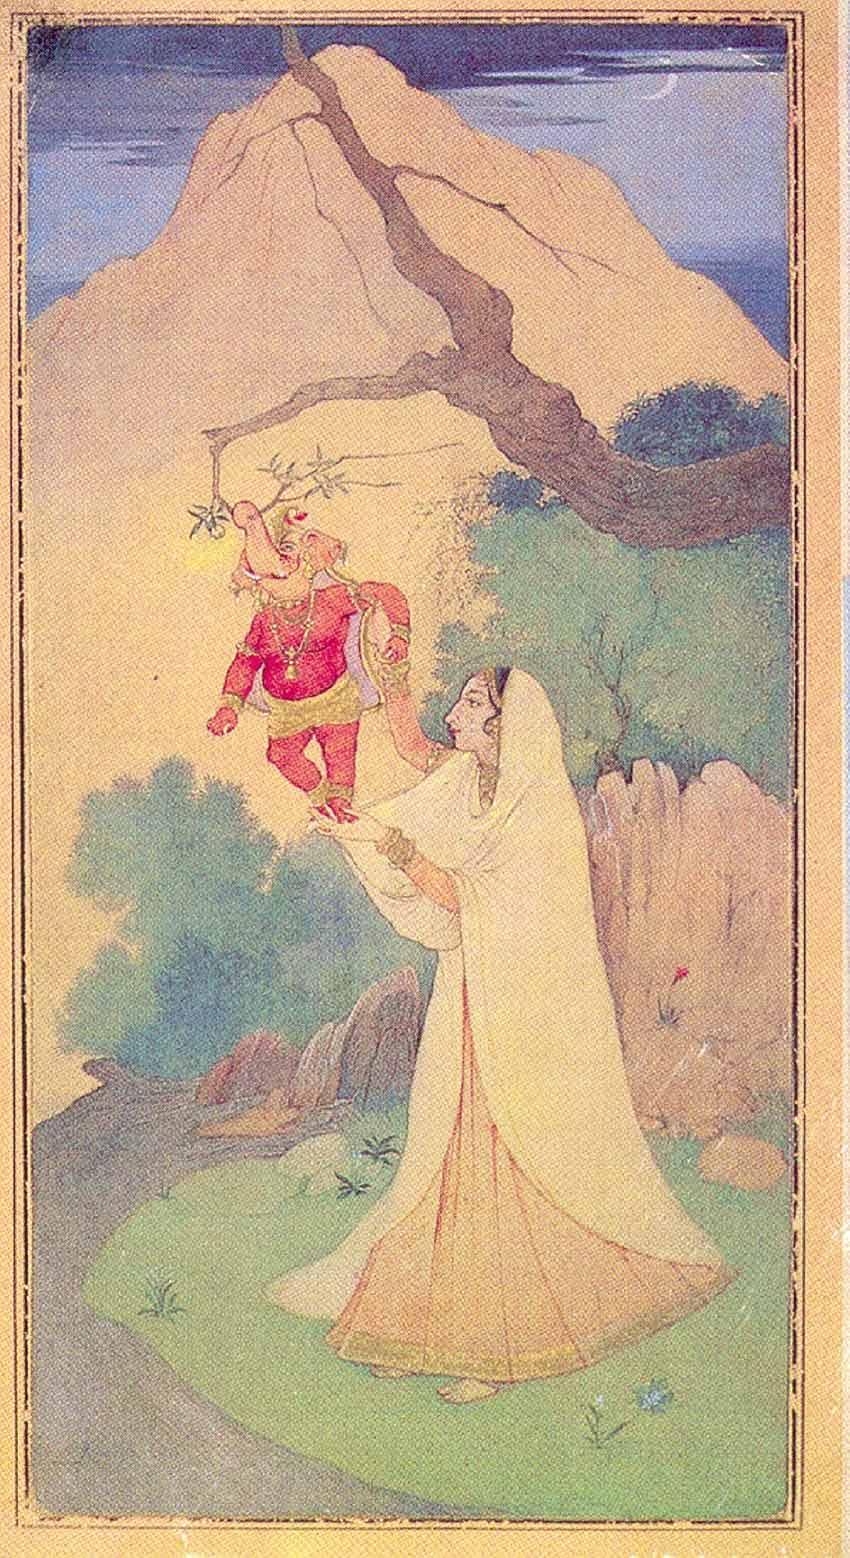 Ganesh-janani by Abanindranath Tagore